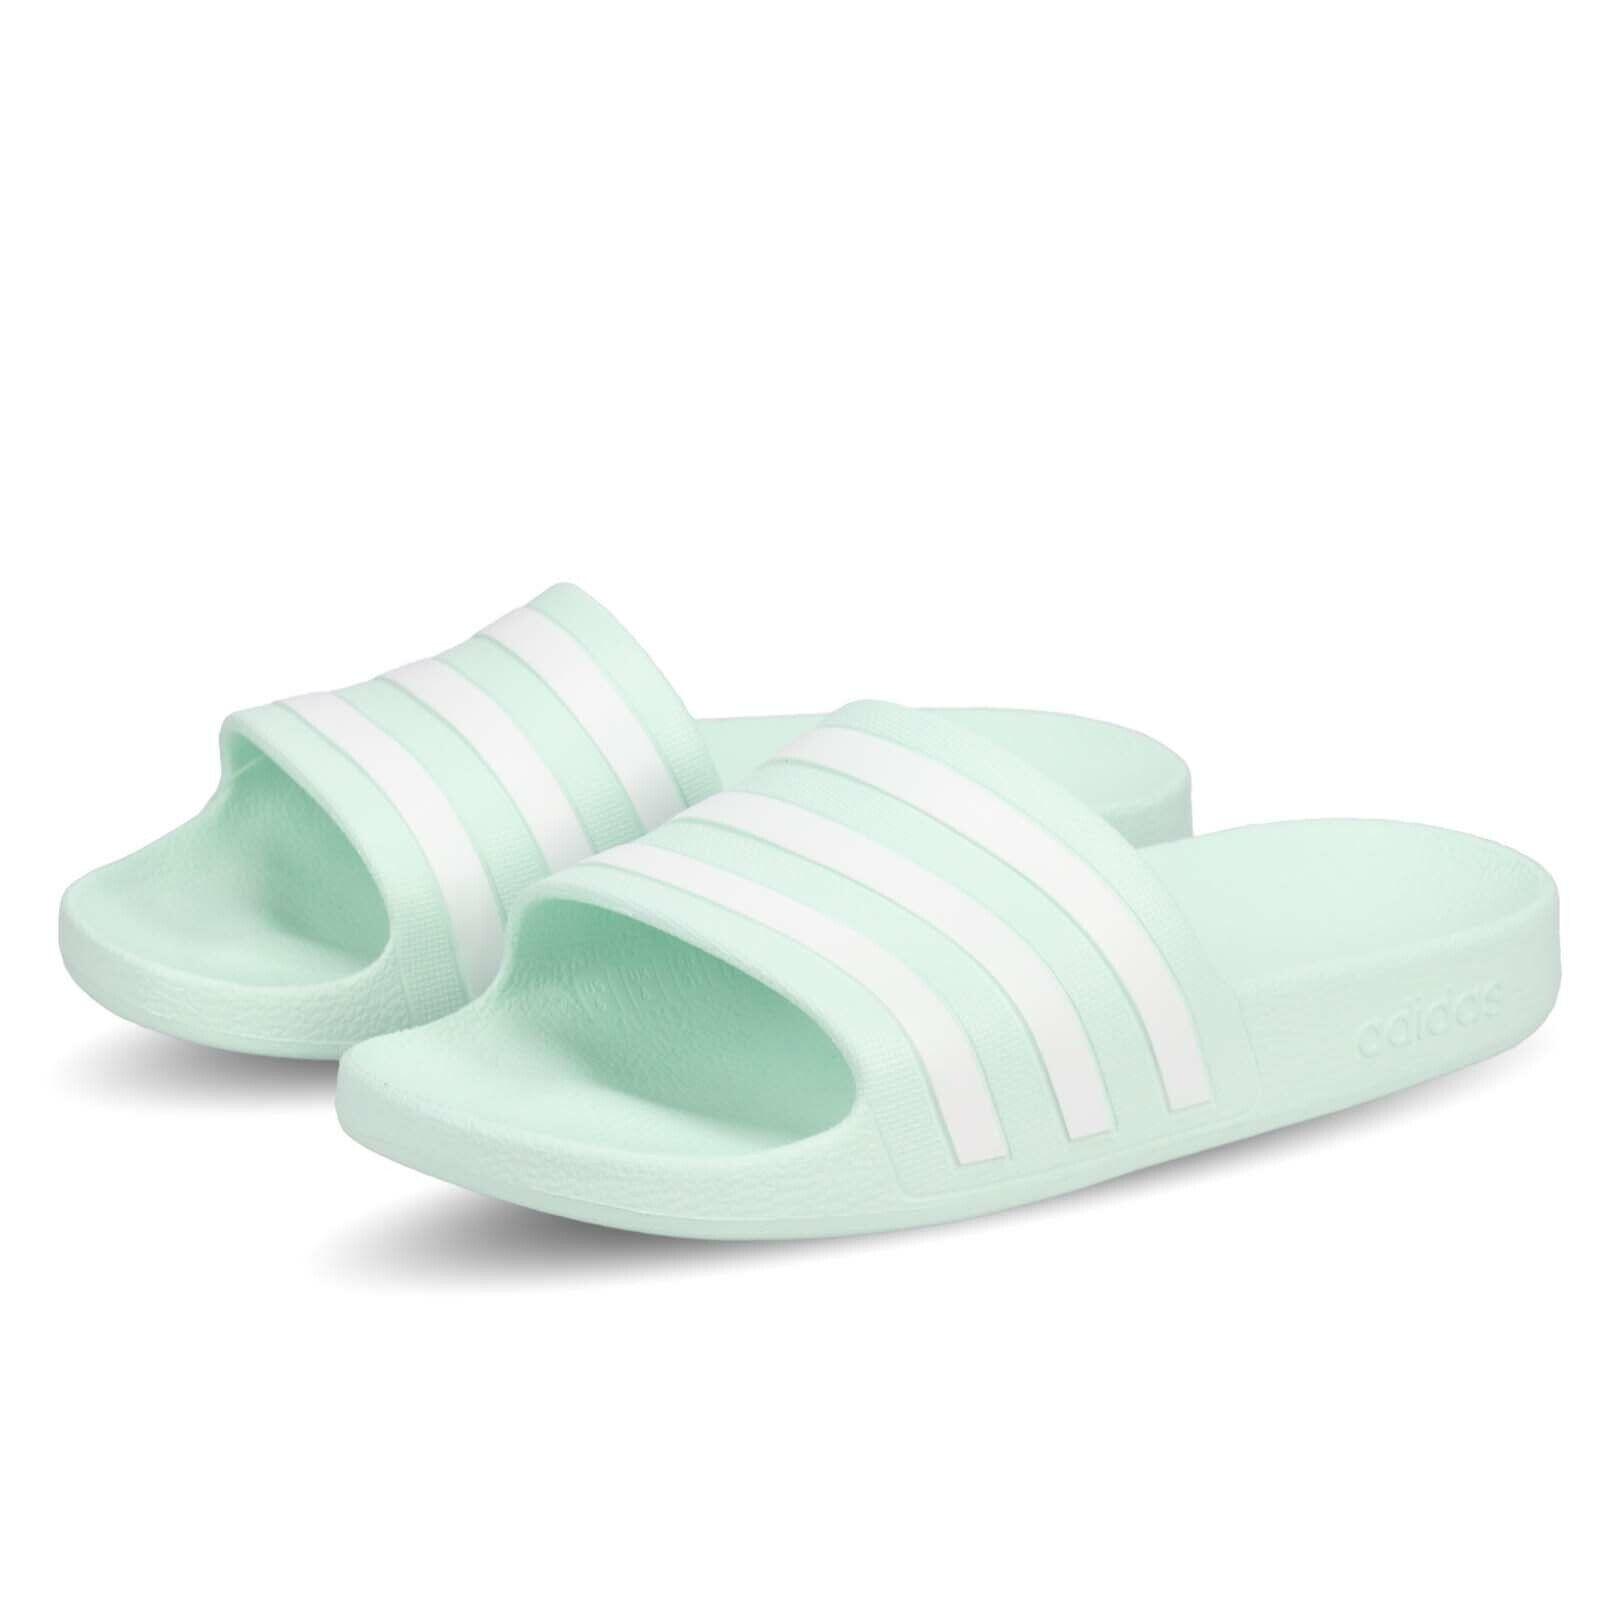 Adidas Adilette Aqua Mint Green White Mens Womens Sandal Slipper Slide F35535